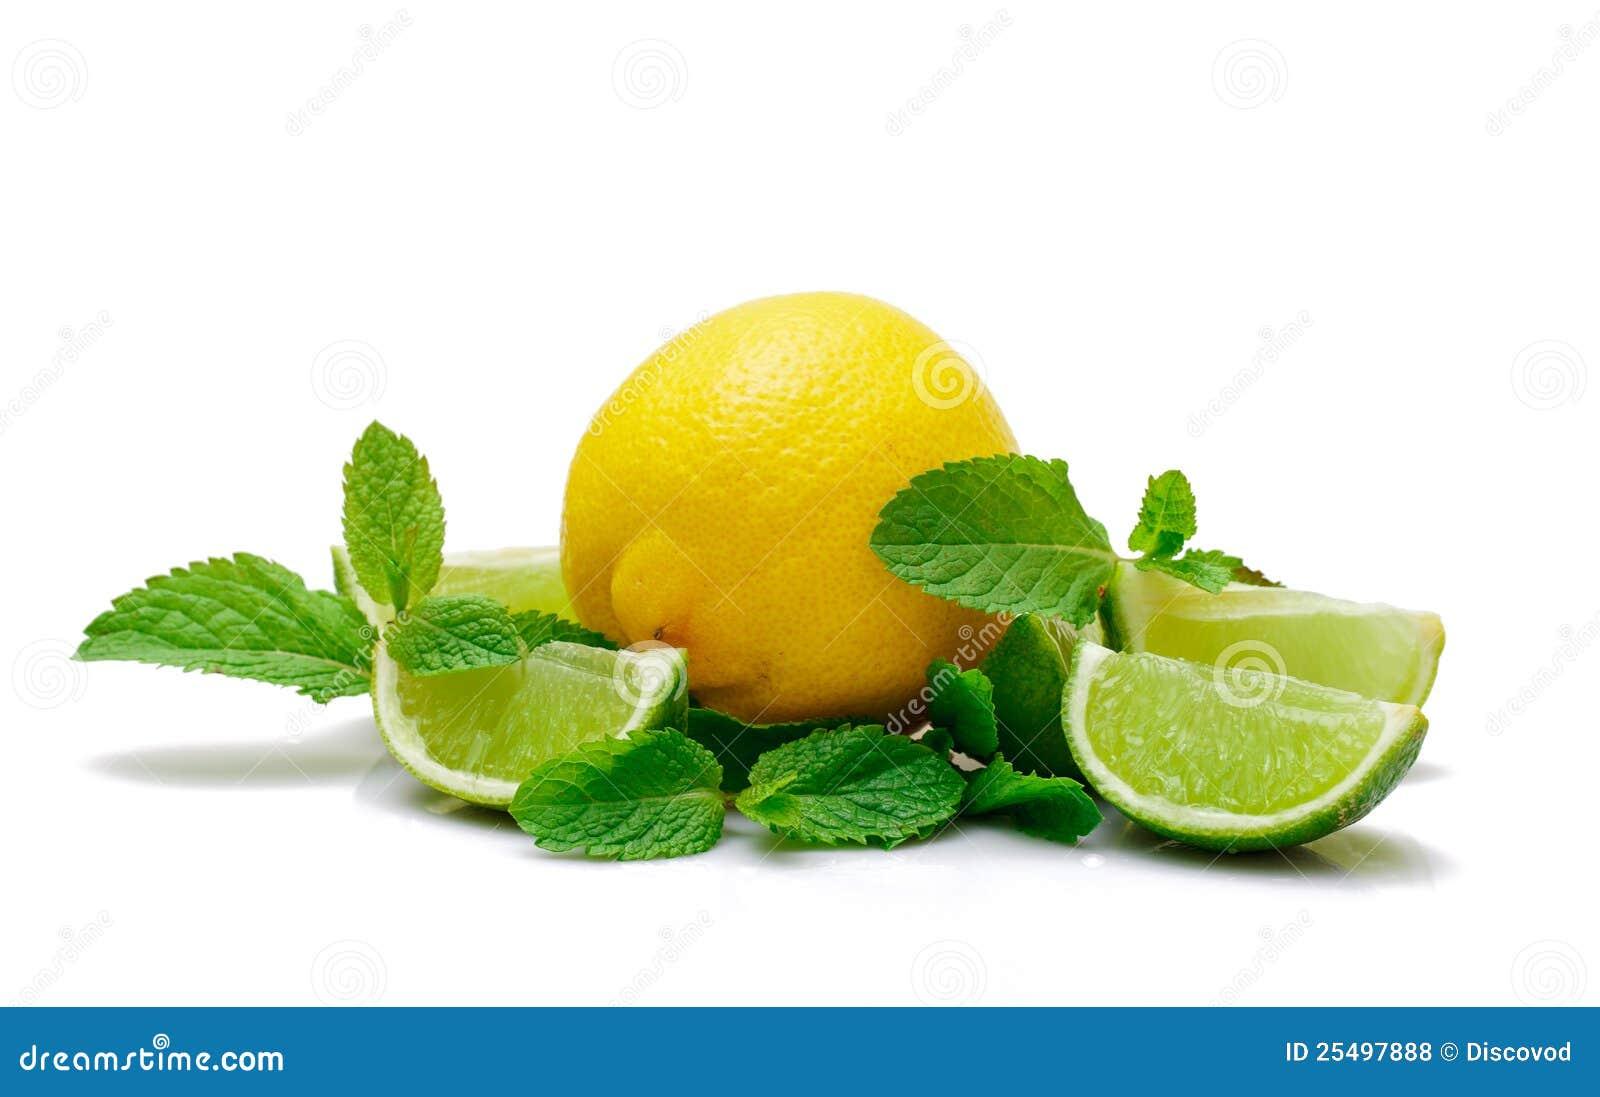 Limón, cal y menta frescos